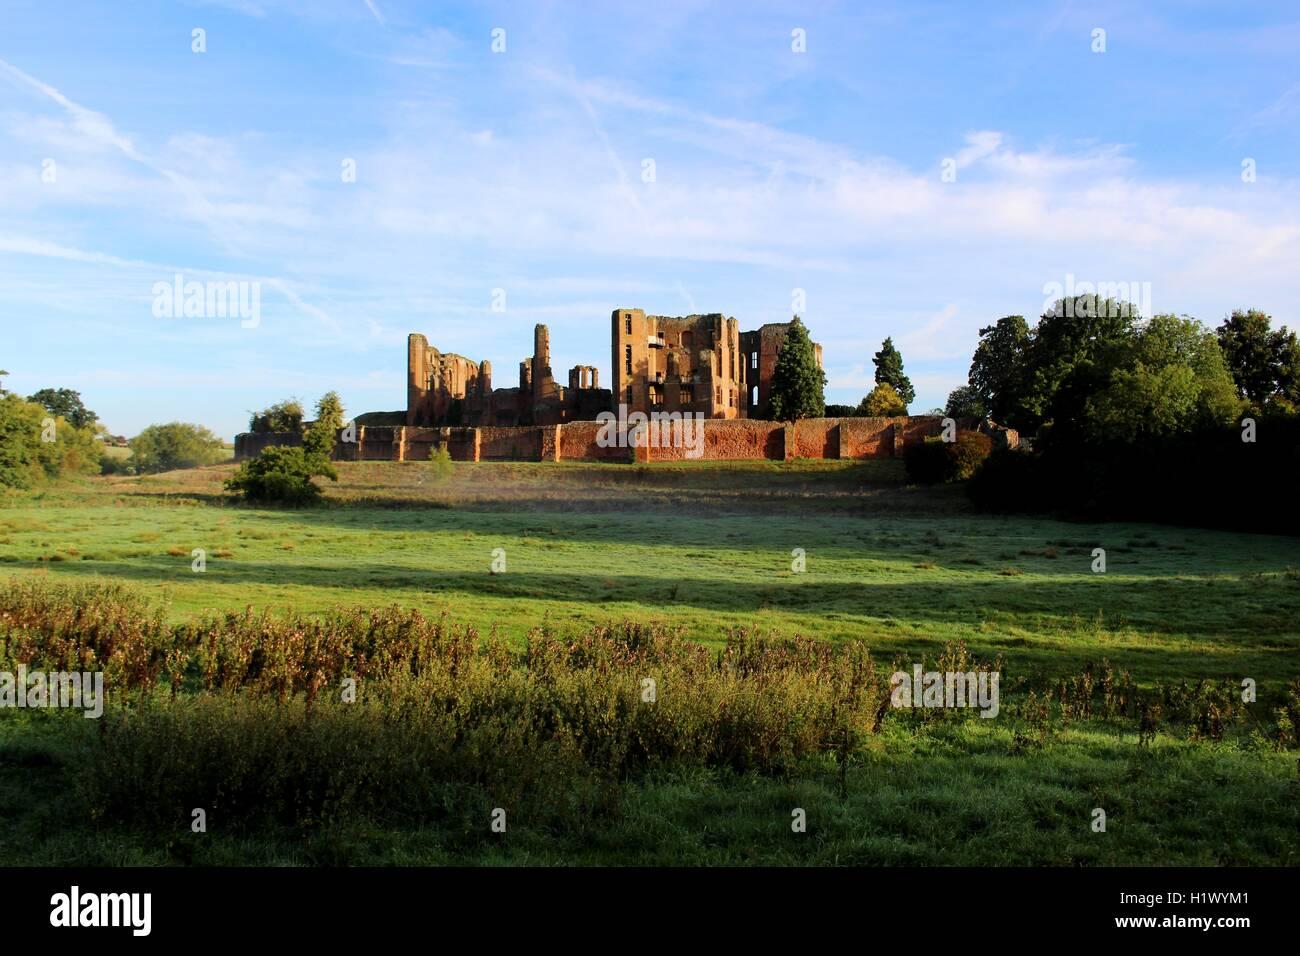 Kenilworth Castle in the morning light. - Stock Image